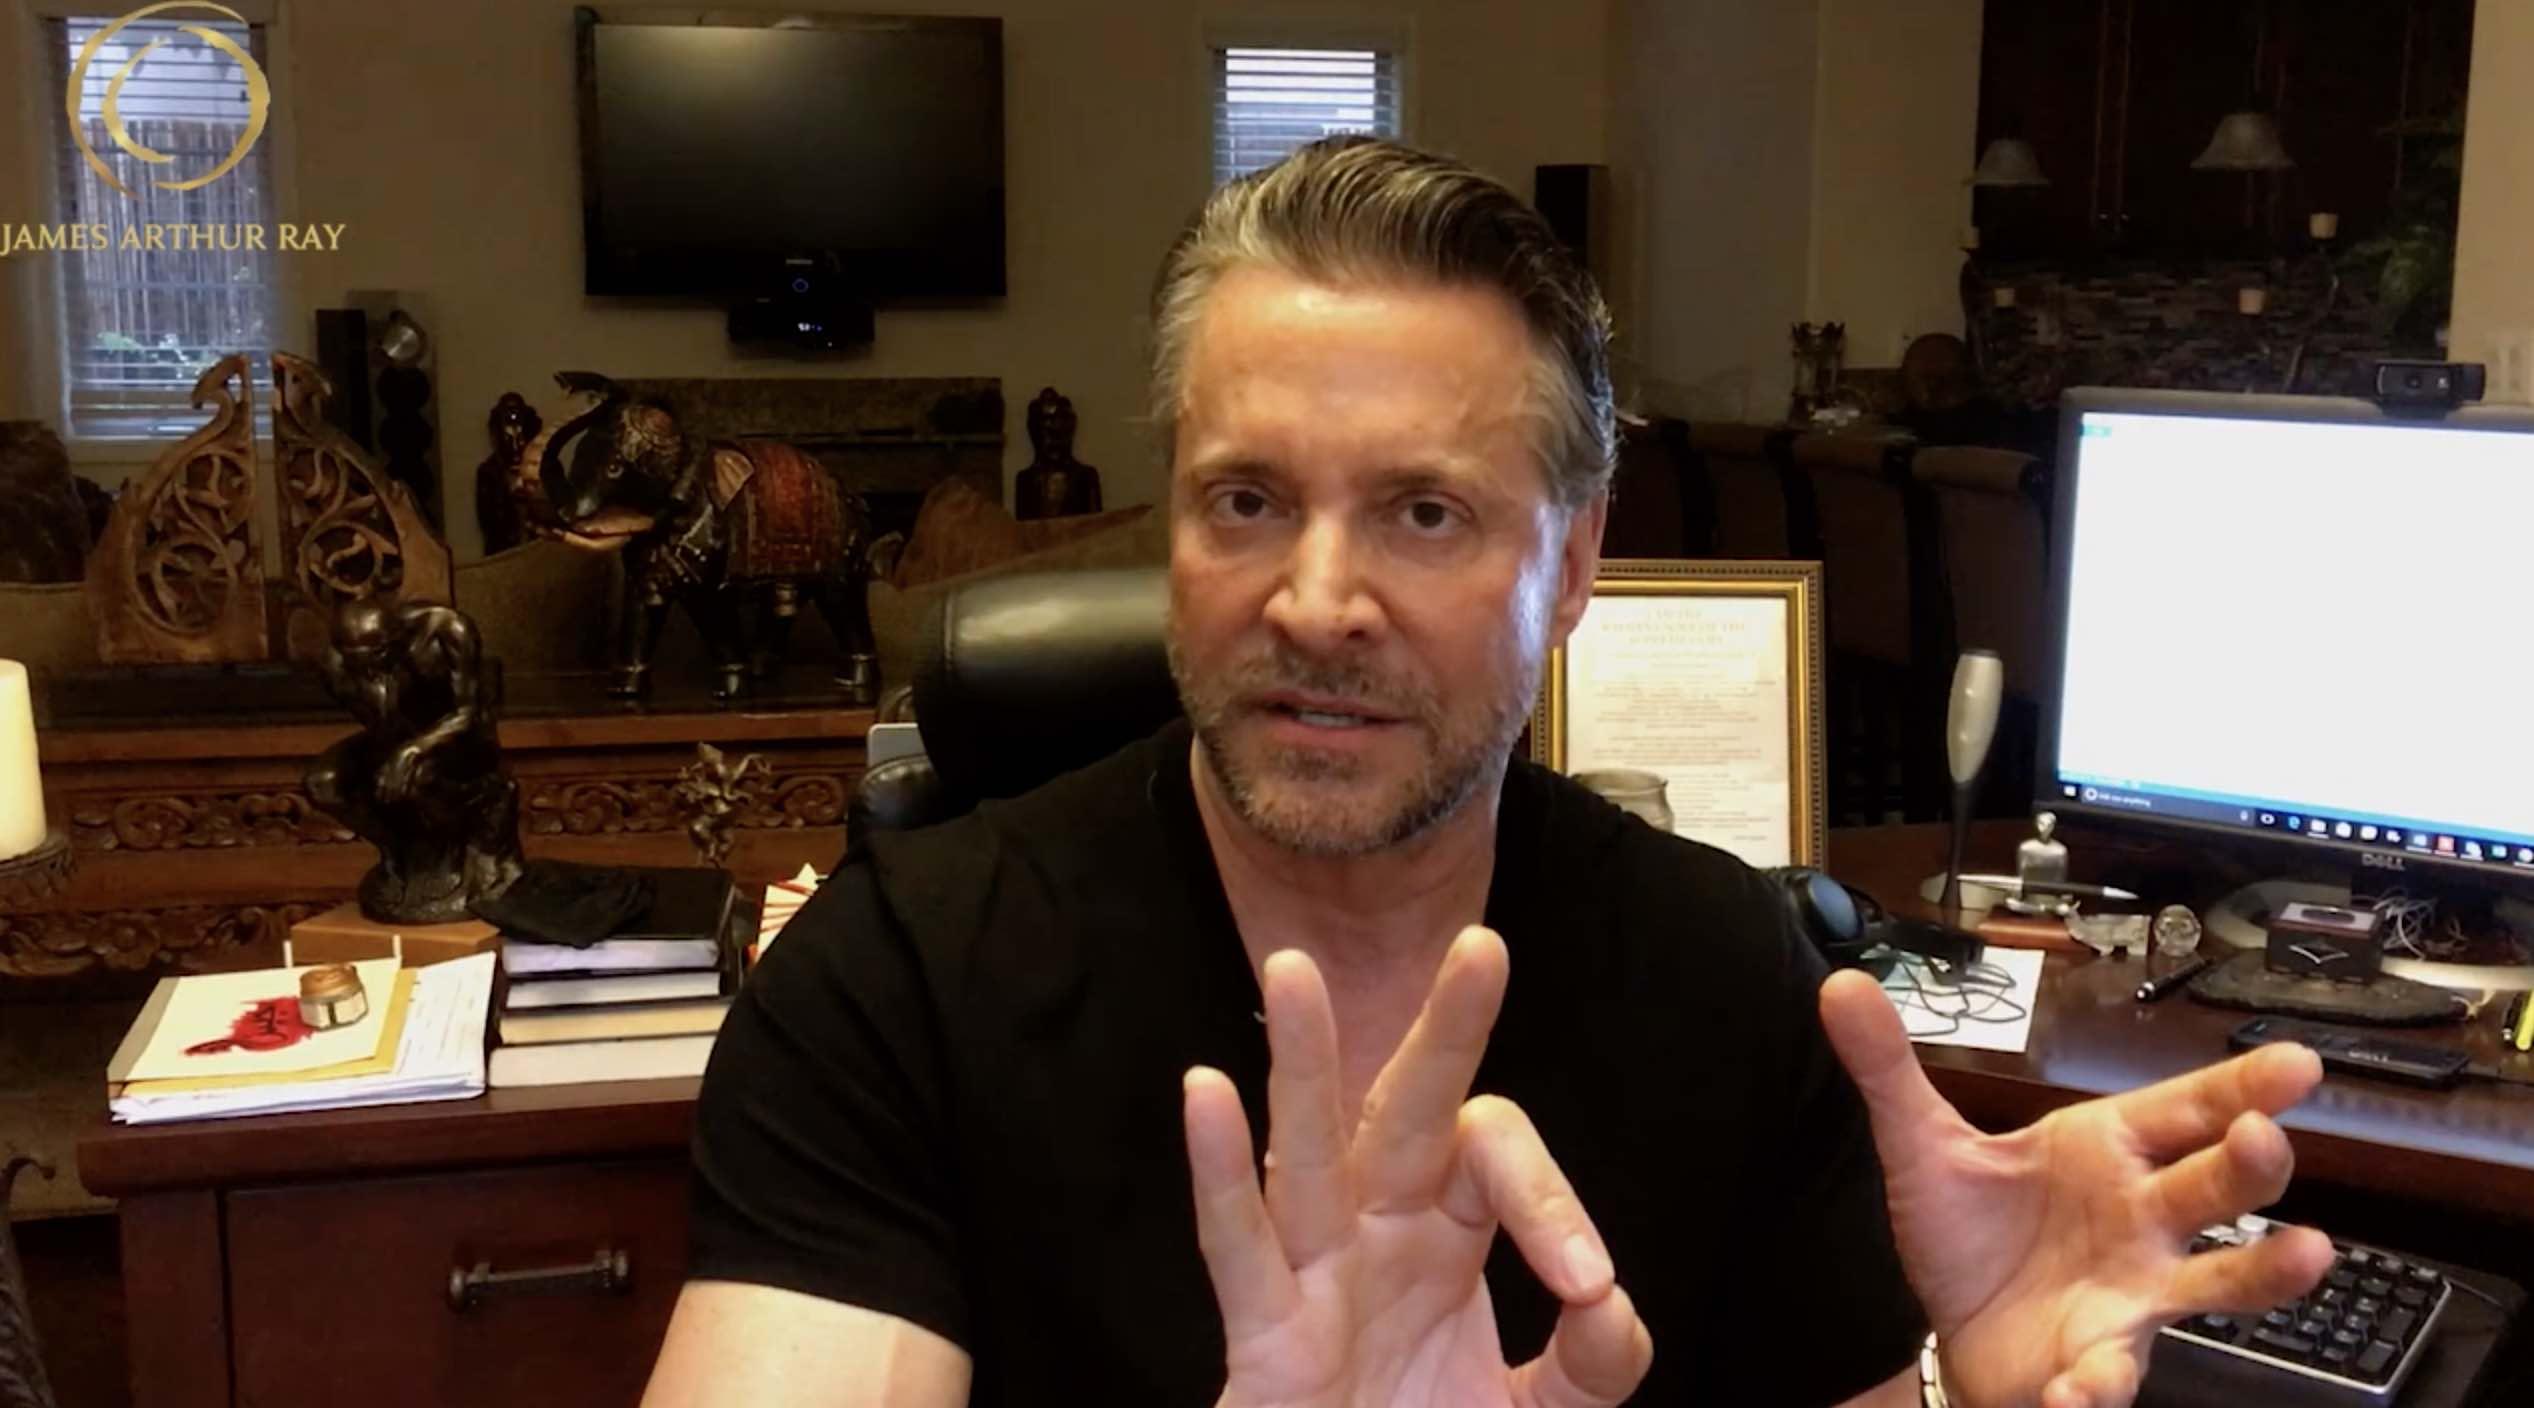 video-the-art-of-warrior-leadership-james-arthur-ray